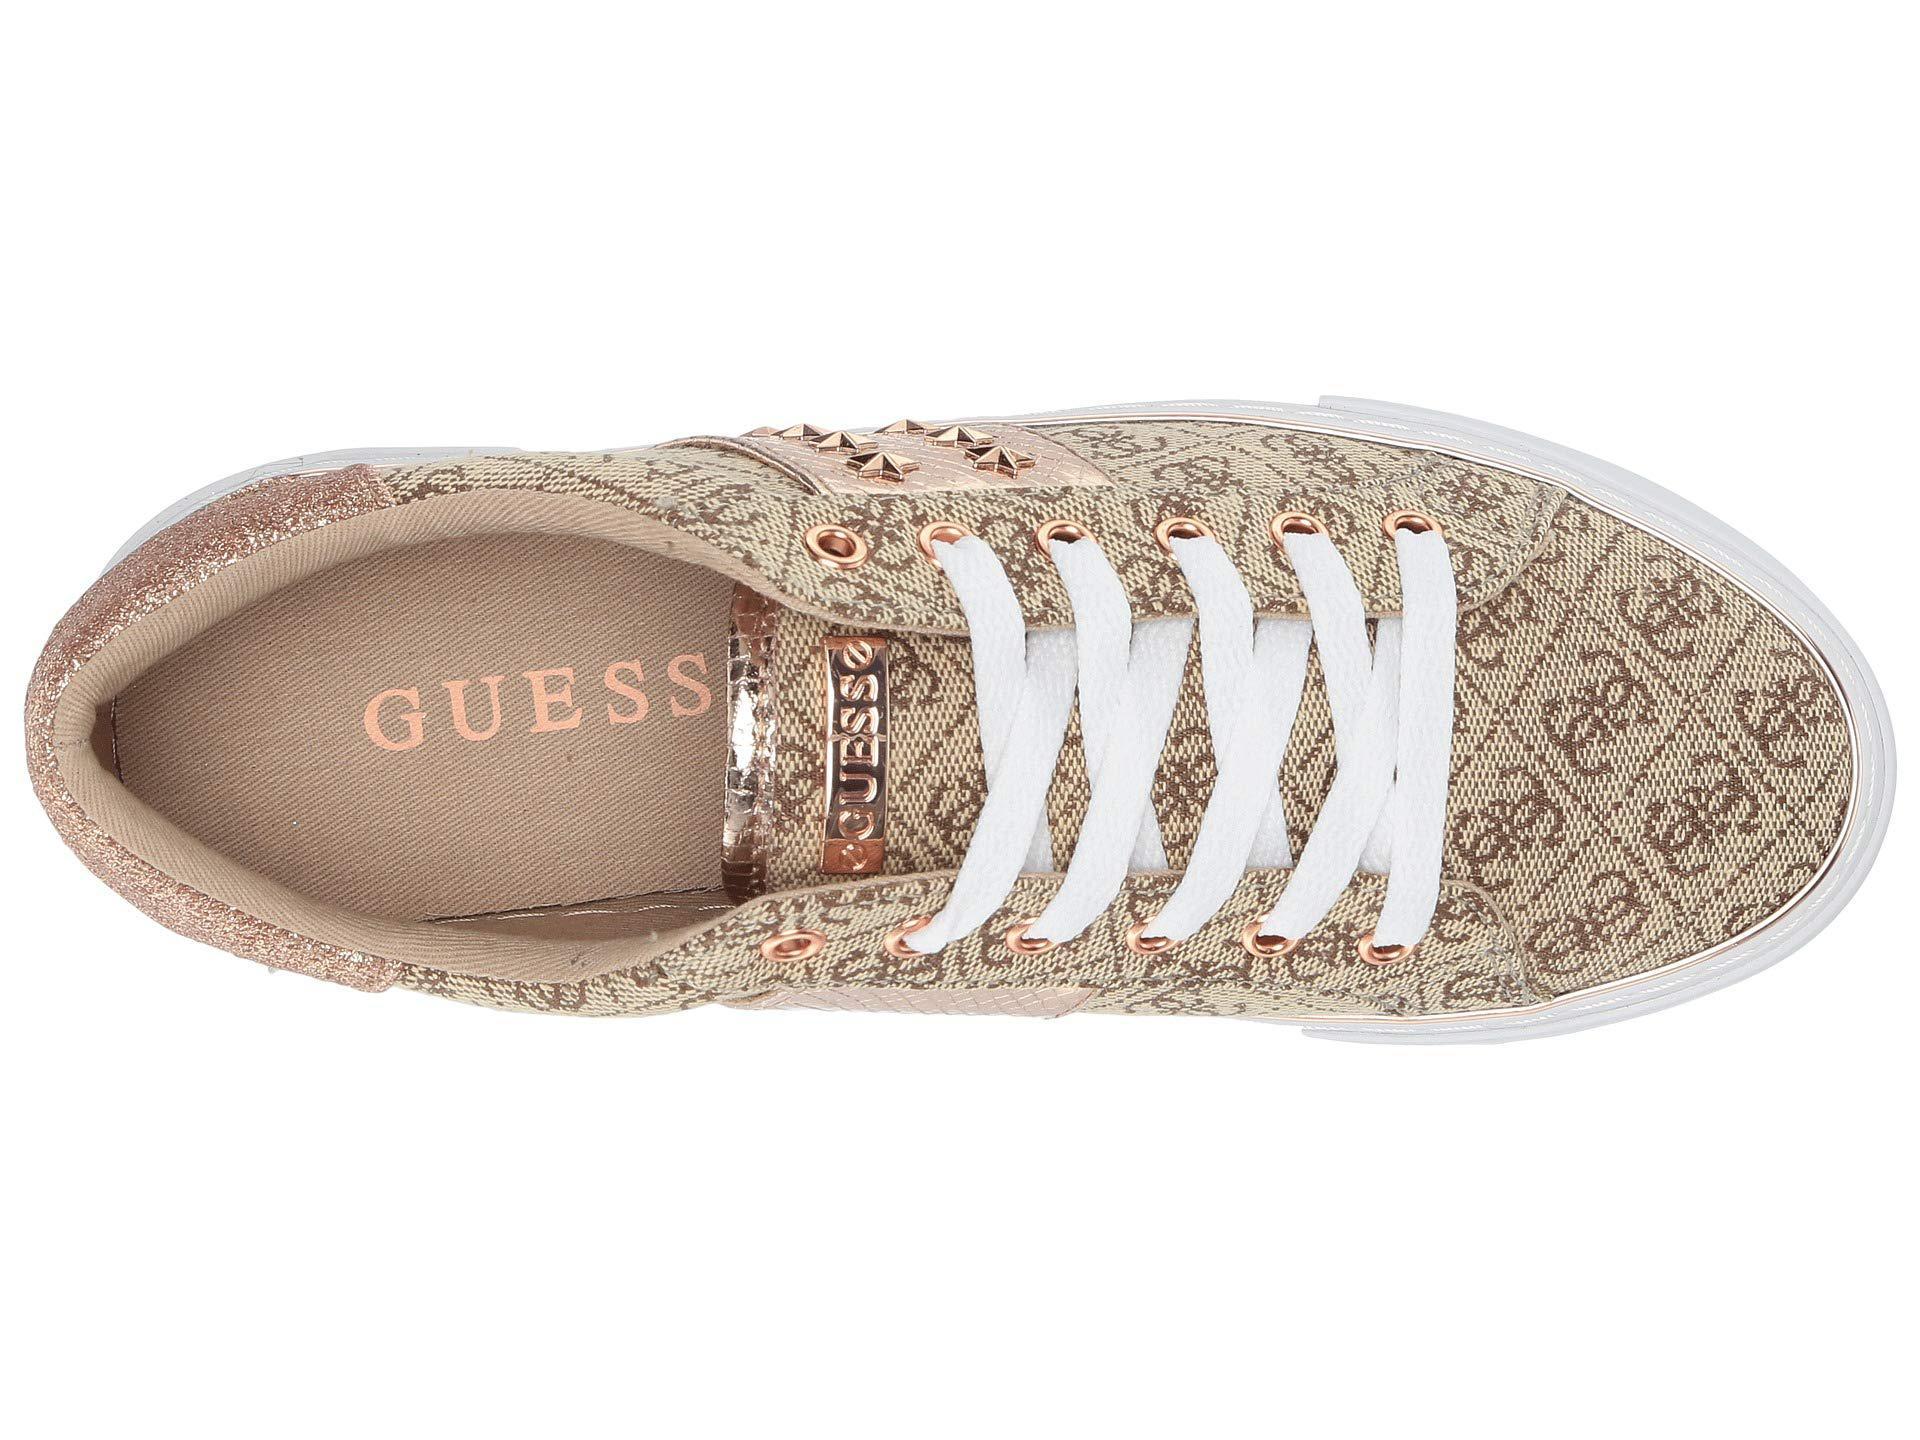 Lyst - Guess Gamer (beige light Brown rose Gold Fabric) Women s Lace ... 152d74174b5